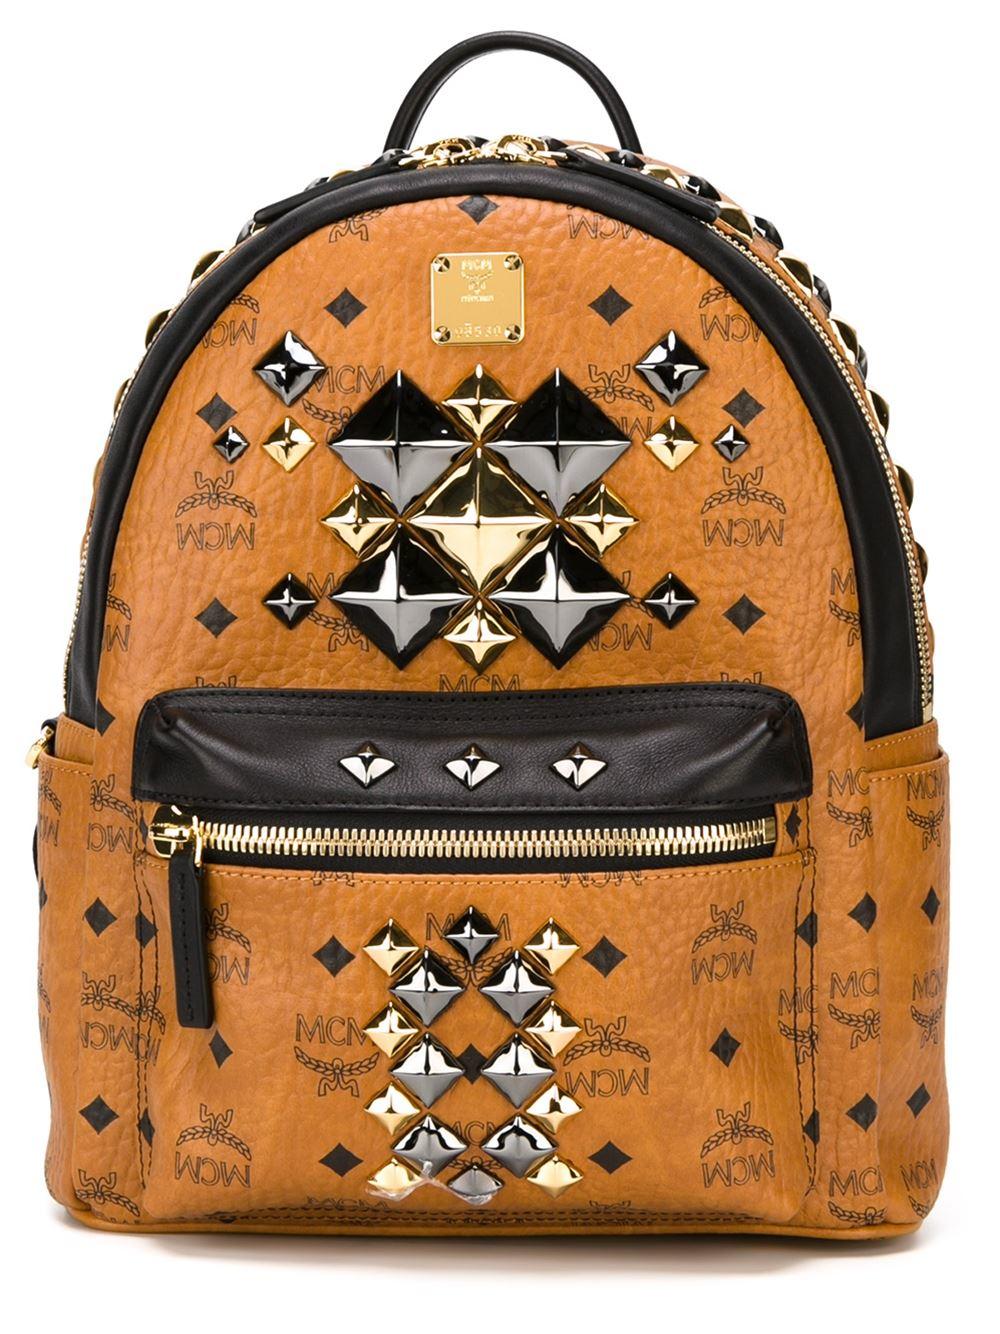 mcm small 39 stark brock 39 backpack in brown lyst. Black Bedroom Furniture Sets. Home Design Ideas